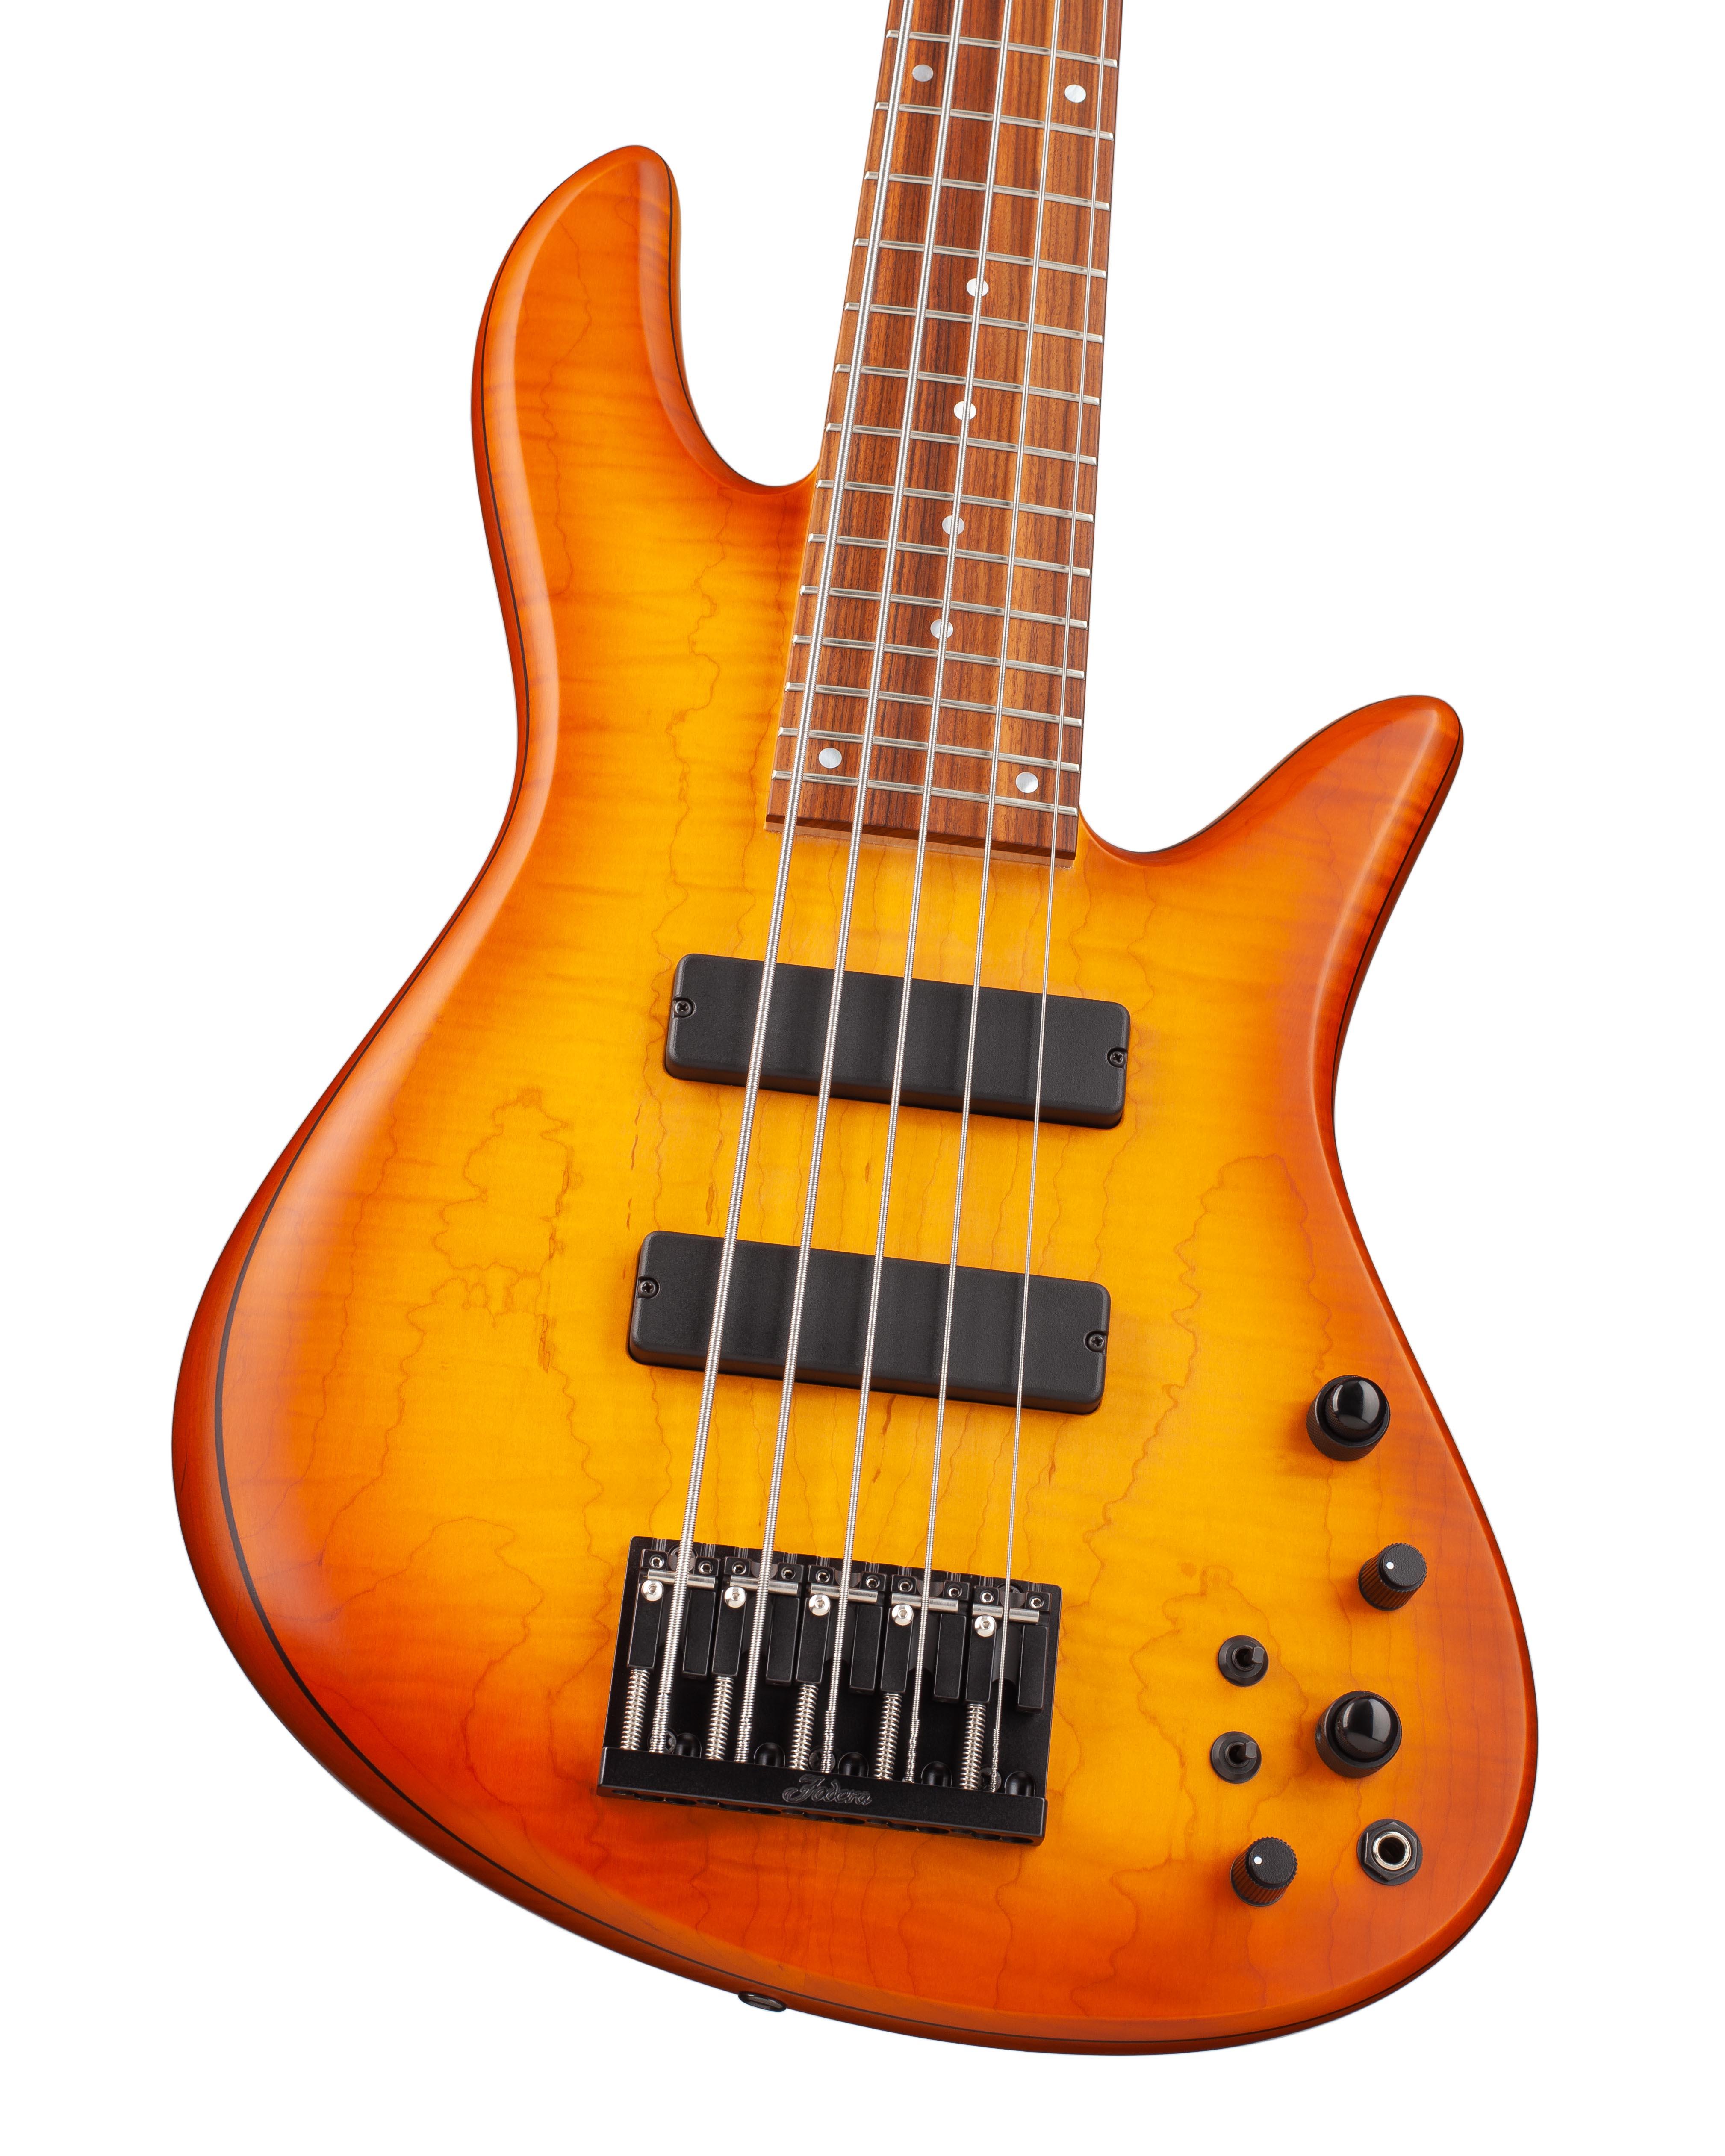 5-String Bass With Warm Orange Topwood